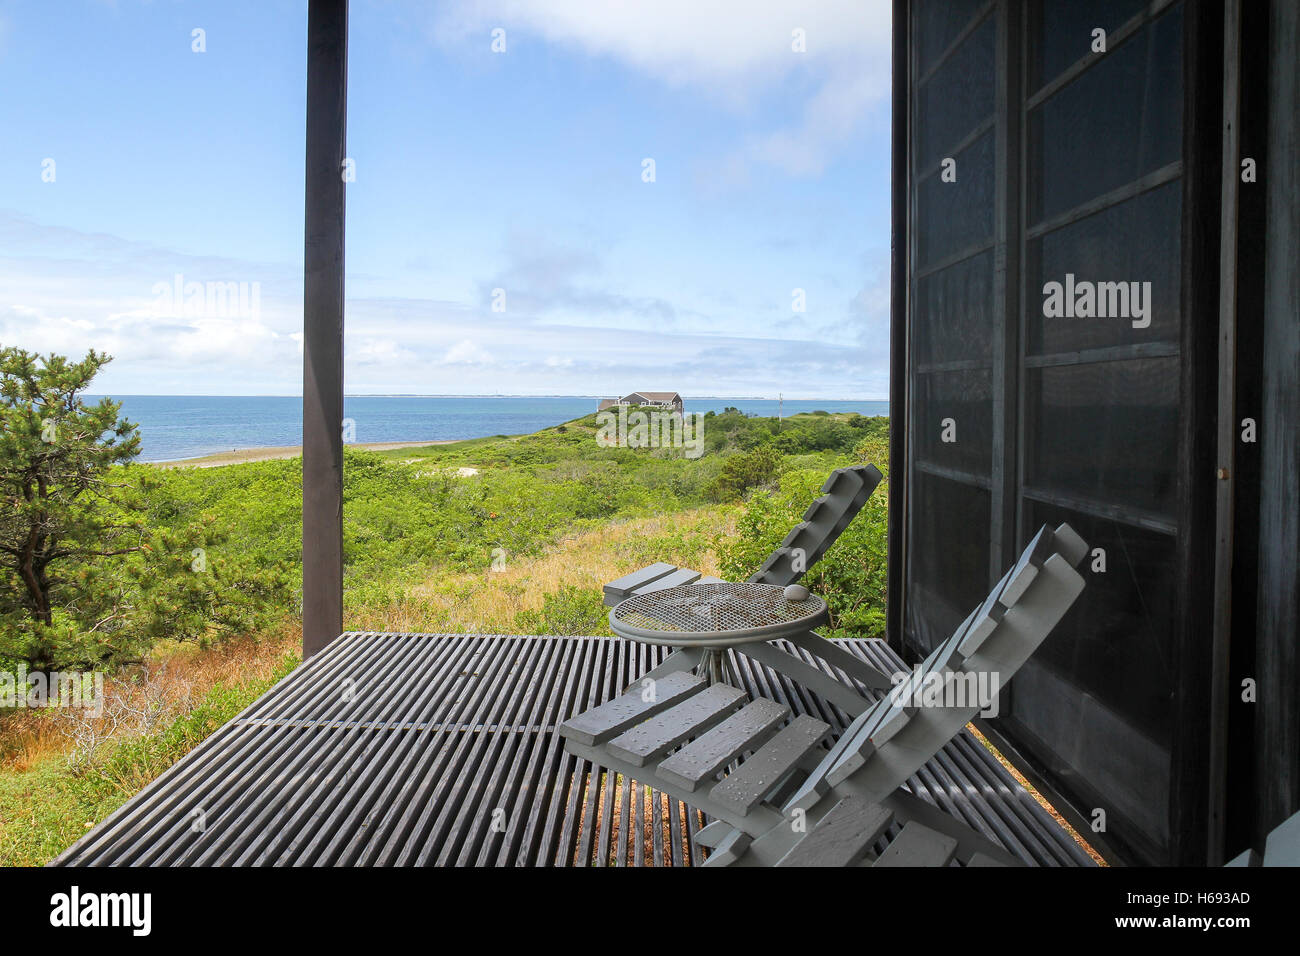 Porch overlooking the ocean at the Hatch Cottage, Wellfleet, Cape Cod, Massachusetts - Stock Image